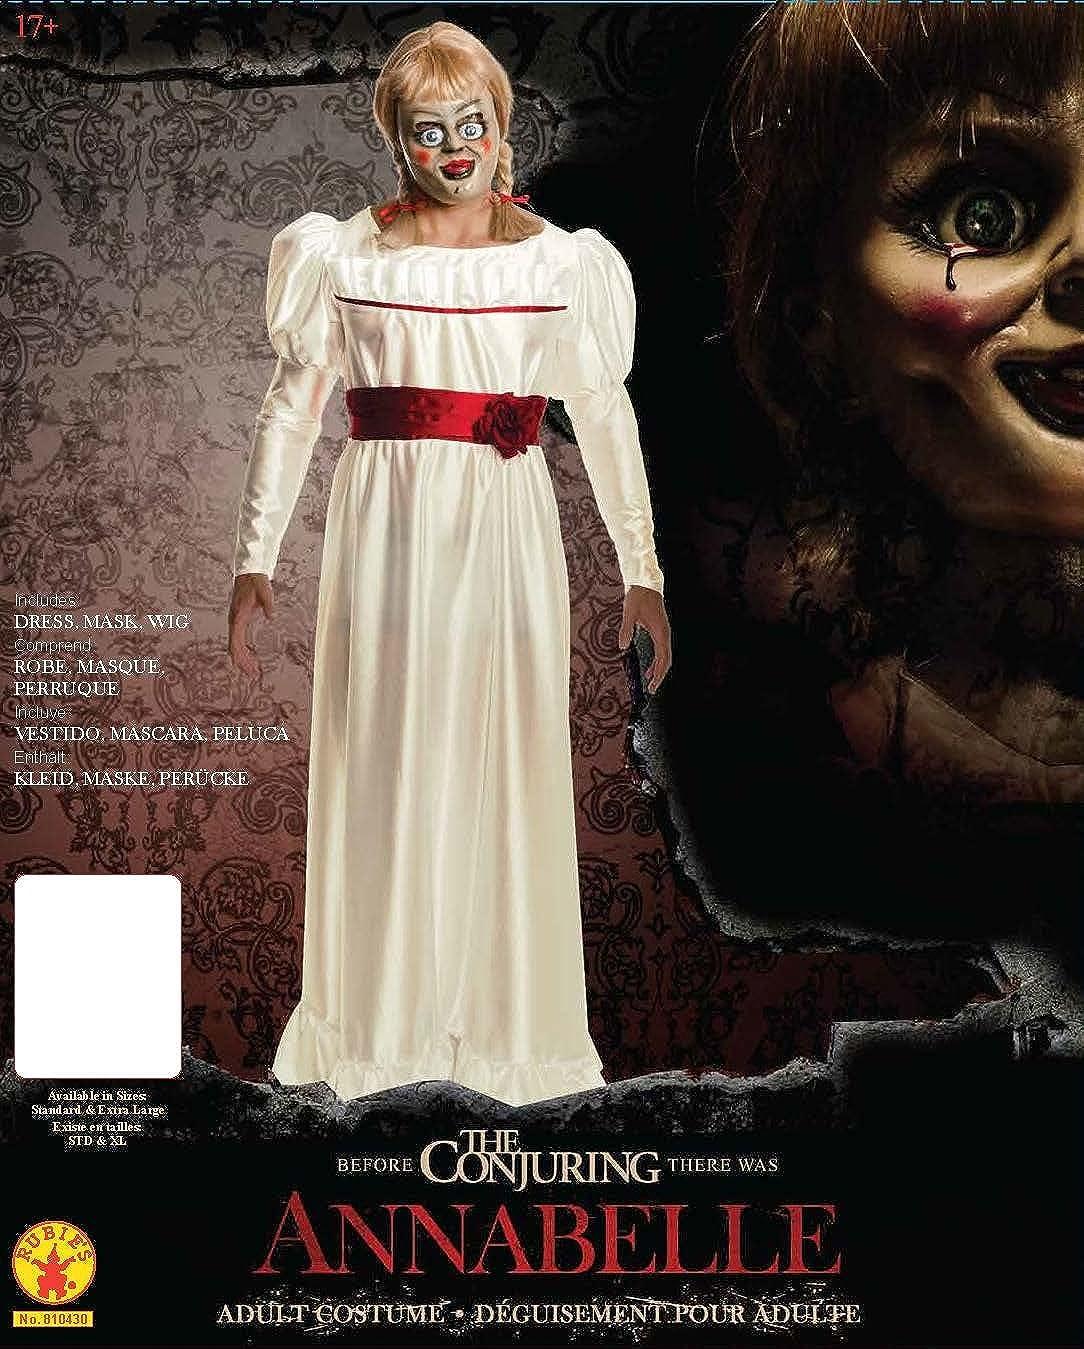 amazoncom rubies annabelle horror costume clothing